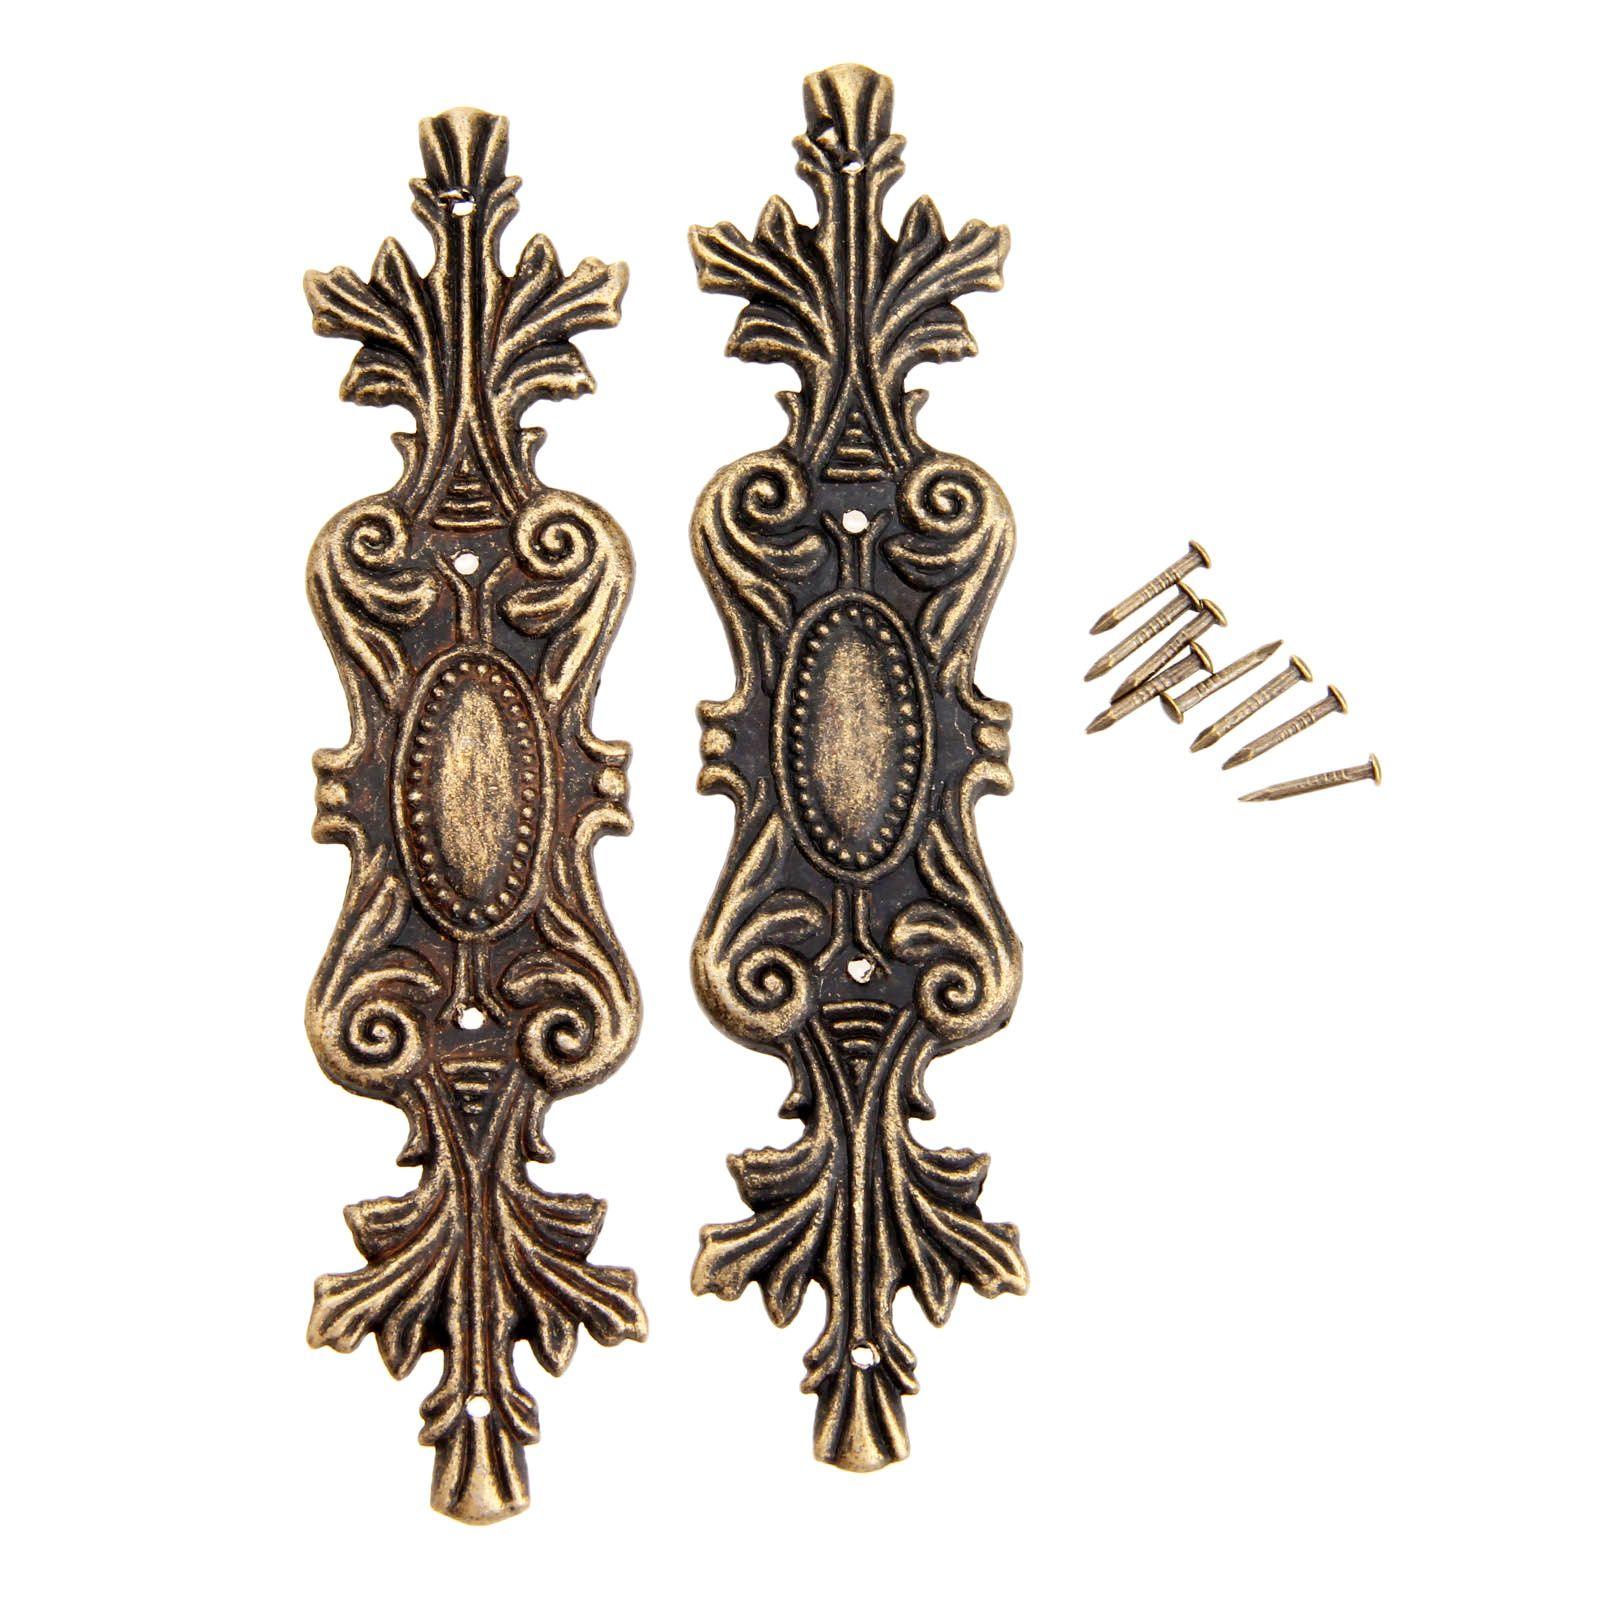 2pcs Antique Decorative Corner Bracket For Furniture Wooden Box Feet Protector Ings